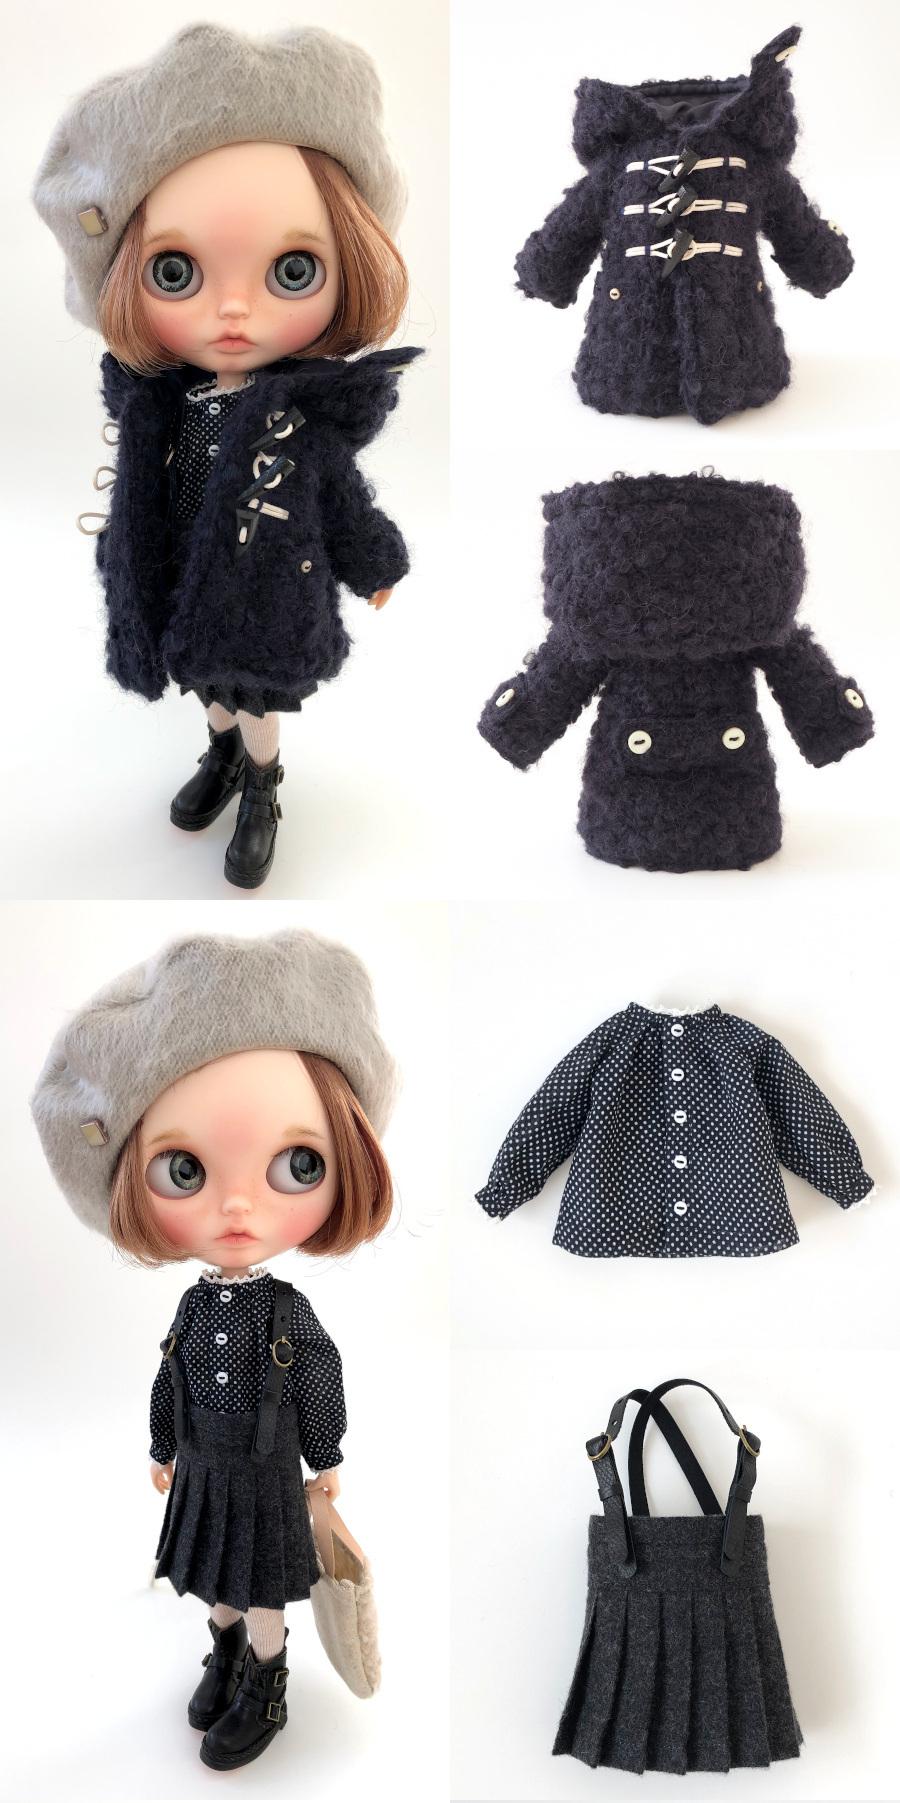 *lucalily * dolls clothes* Loop Tweed Duffle Coat Set *_d0217189_12153239.jpeg